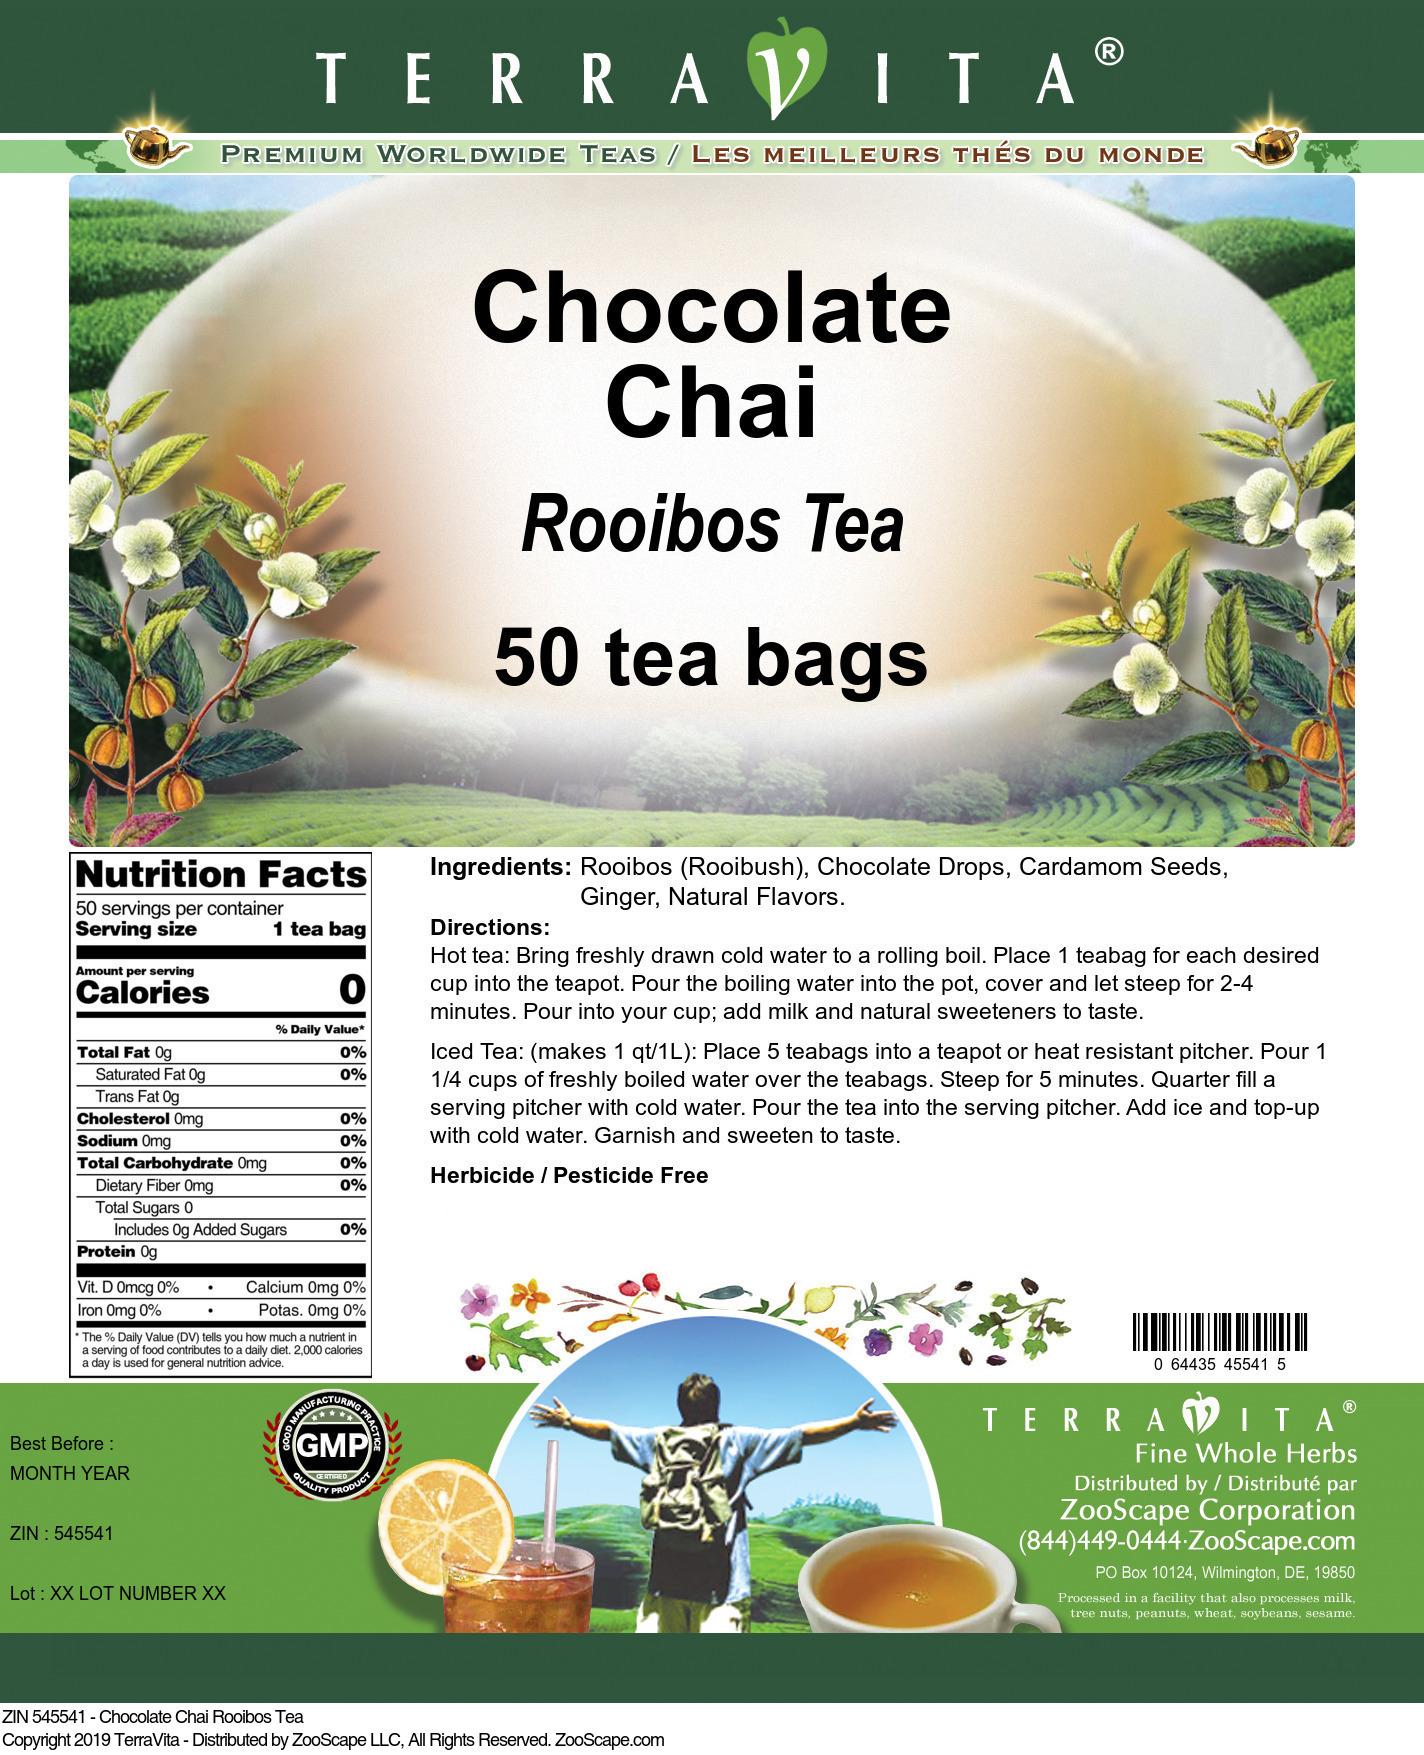 Chocolate Chai Rooibos Tea